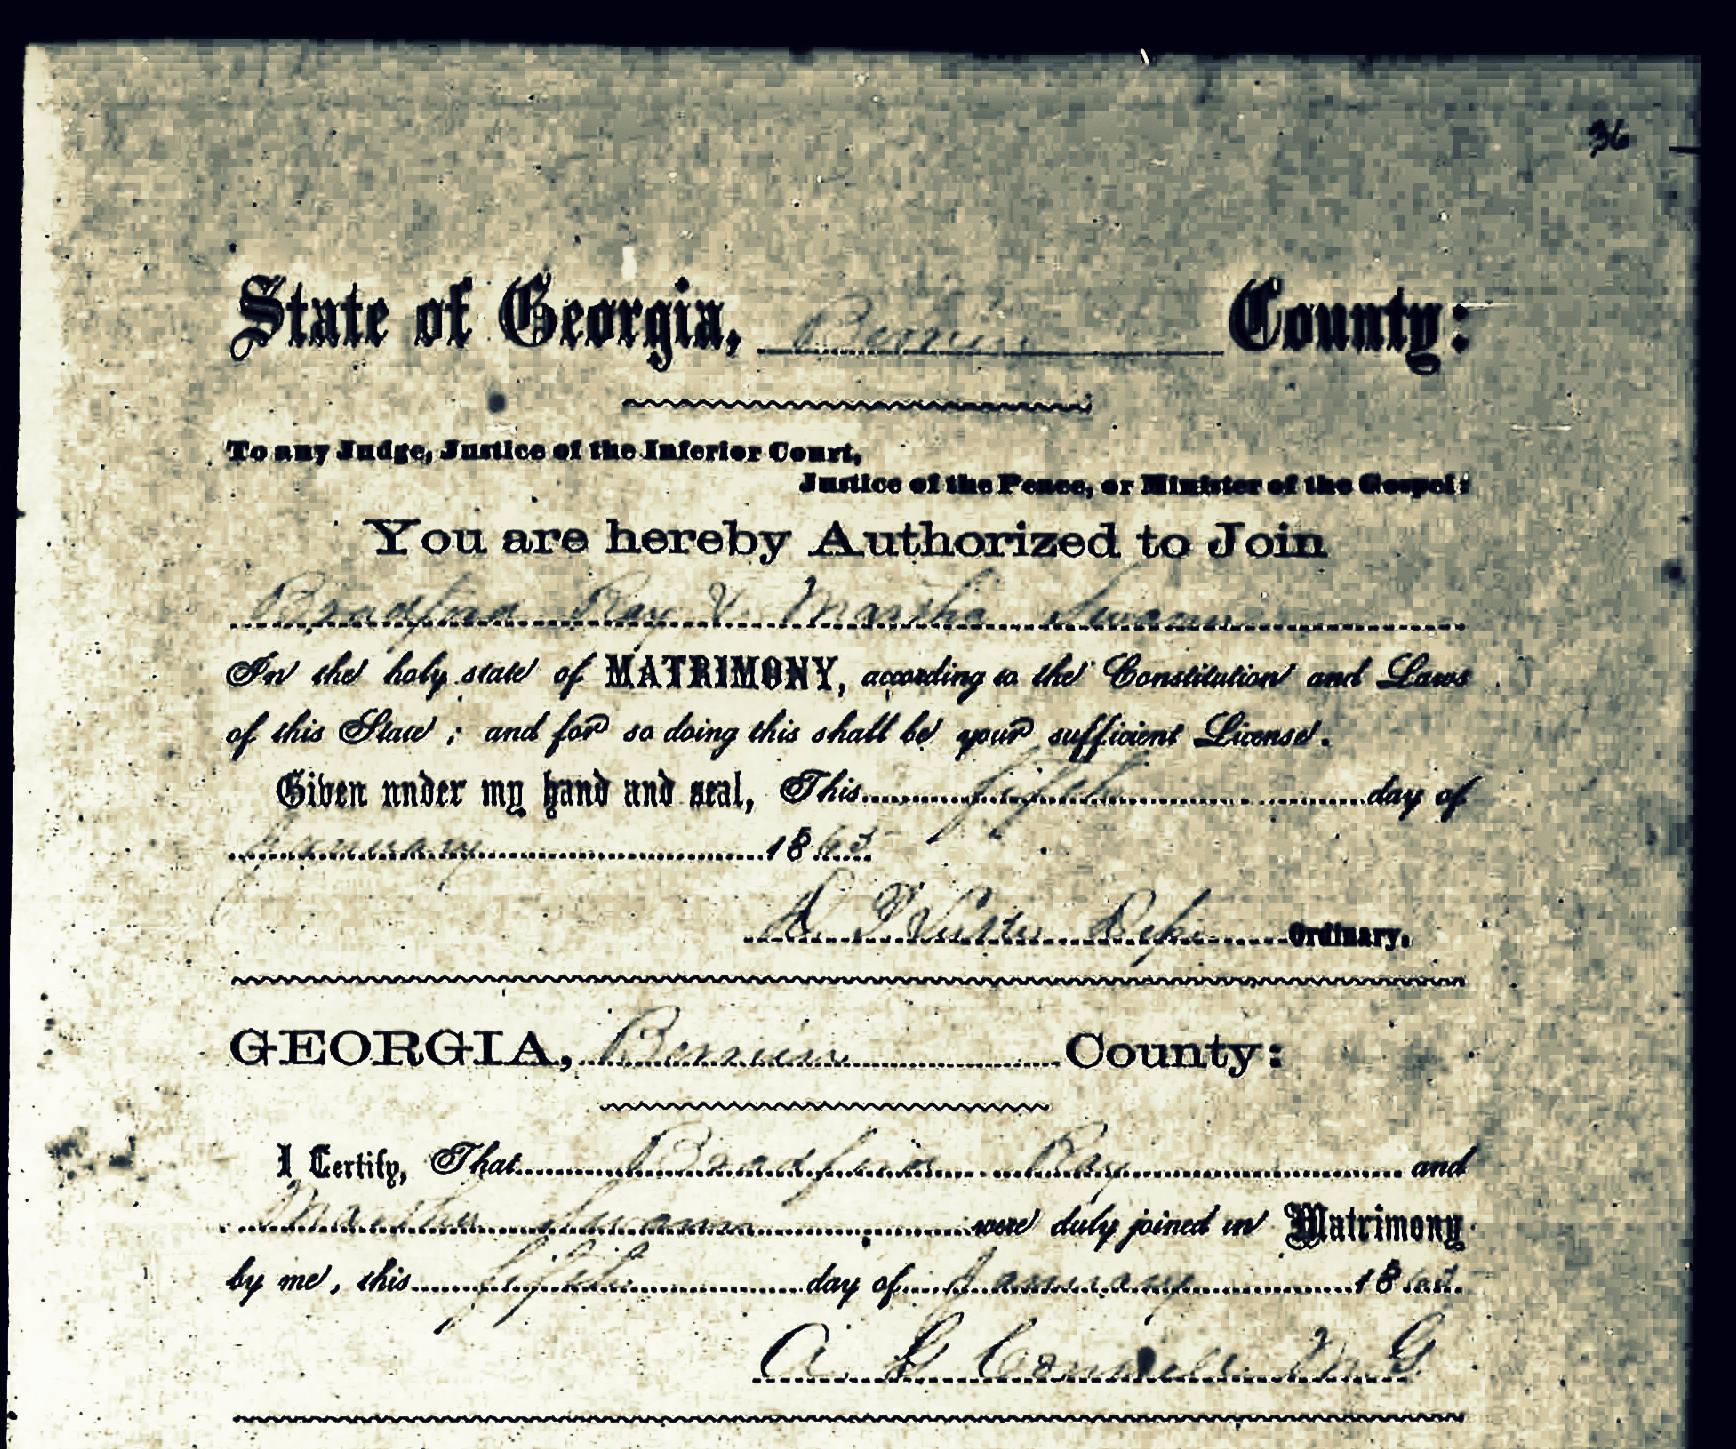 Flat creek church ray city history blog marriage certificate of bradford ray and martha swann january 5 1865 berrien county aiddatafo Choice Image